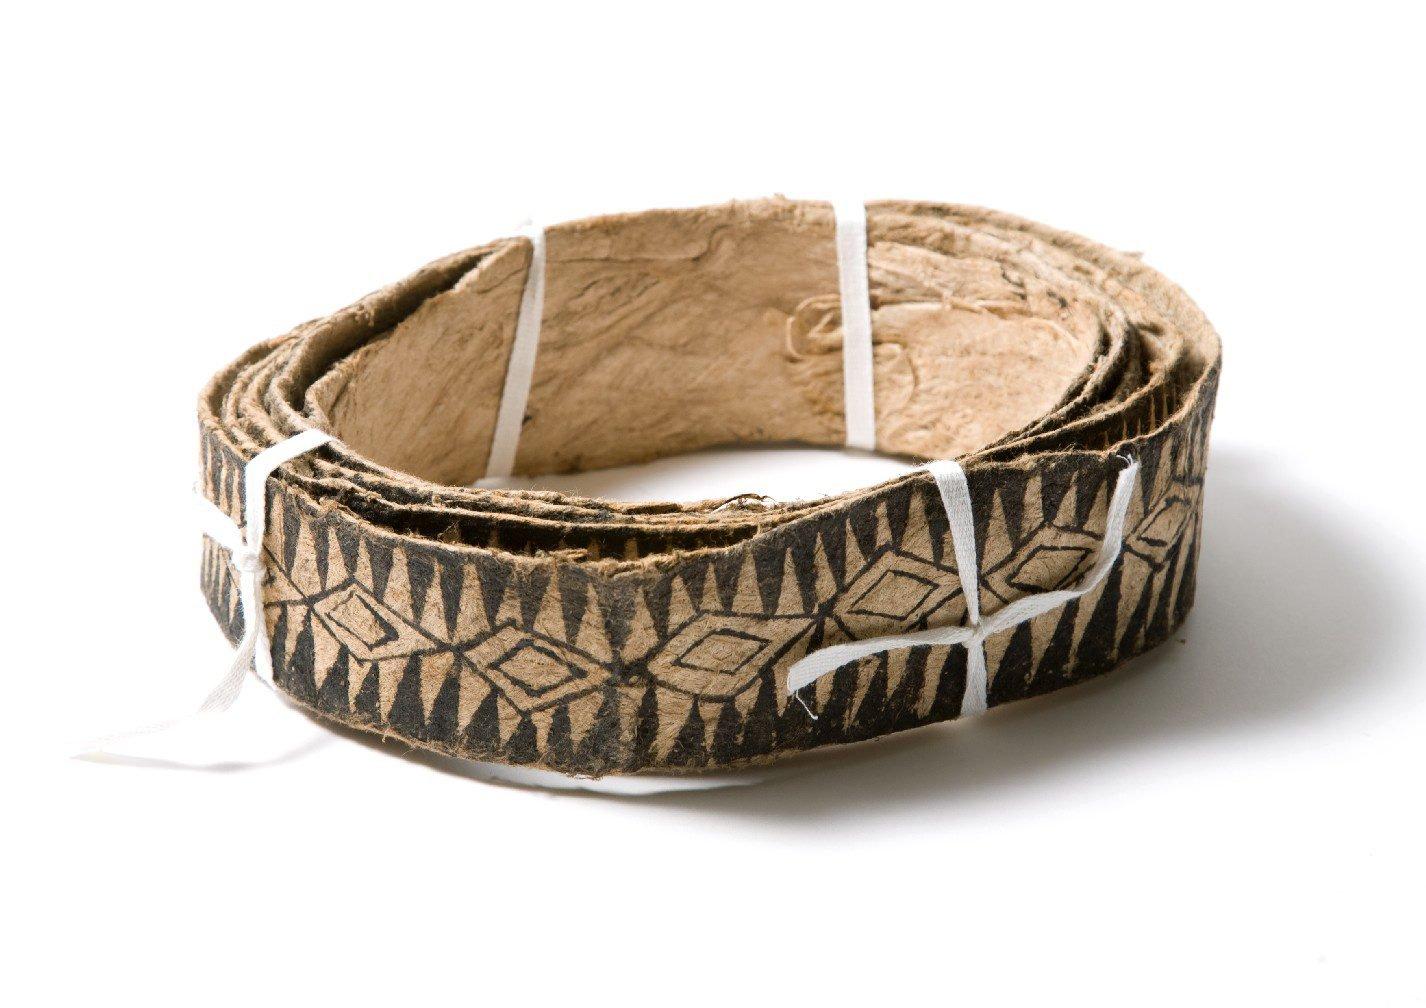 Barkcloth belt, Vanuatu.